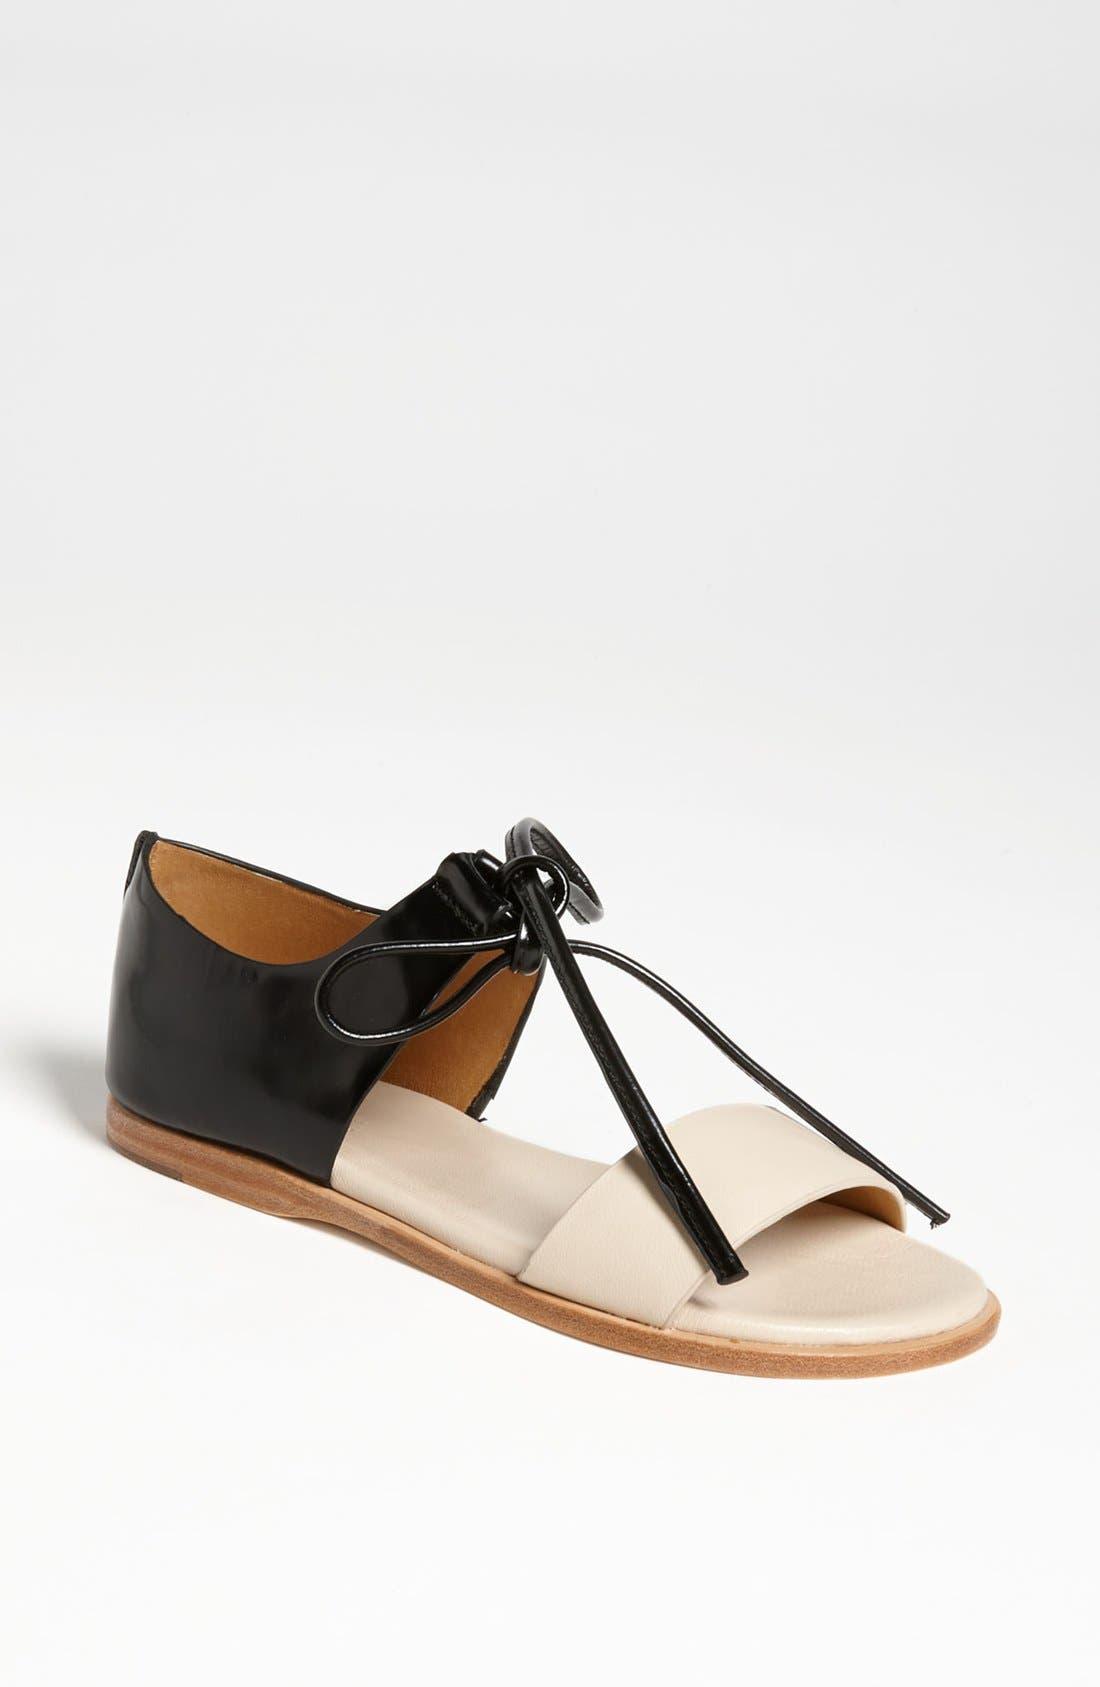 Alternate Image 1 Selected - Fiel 'Noss' Sandal